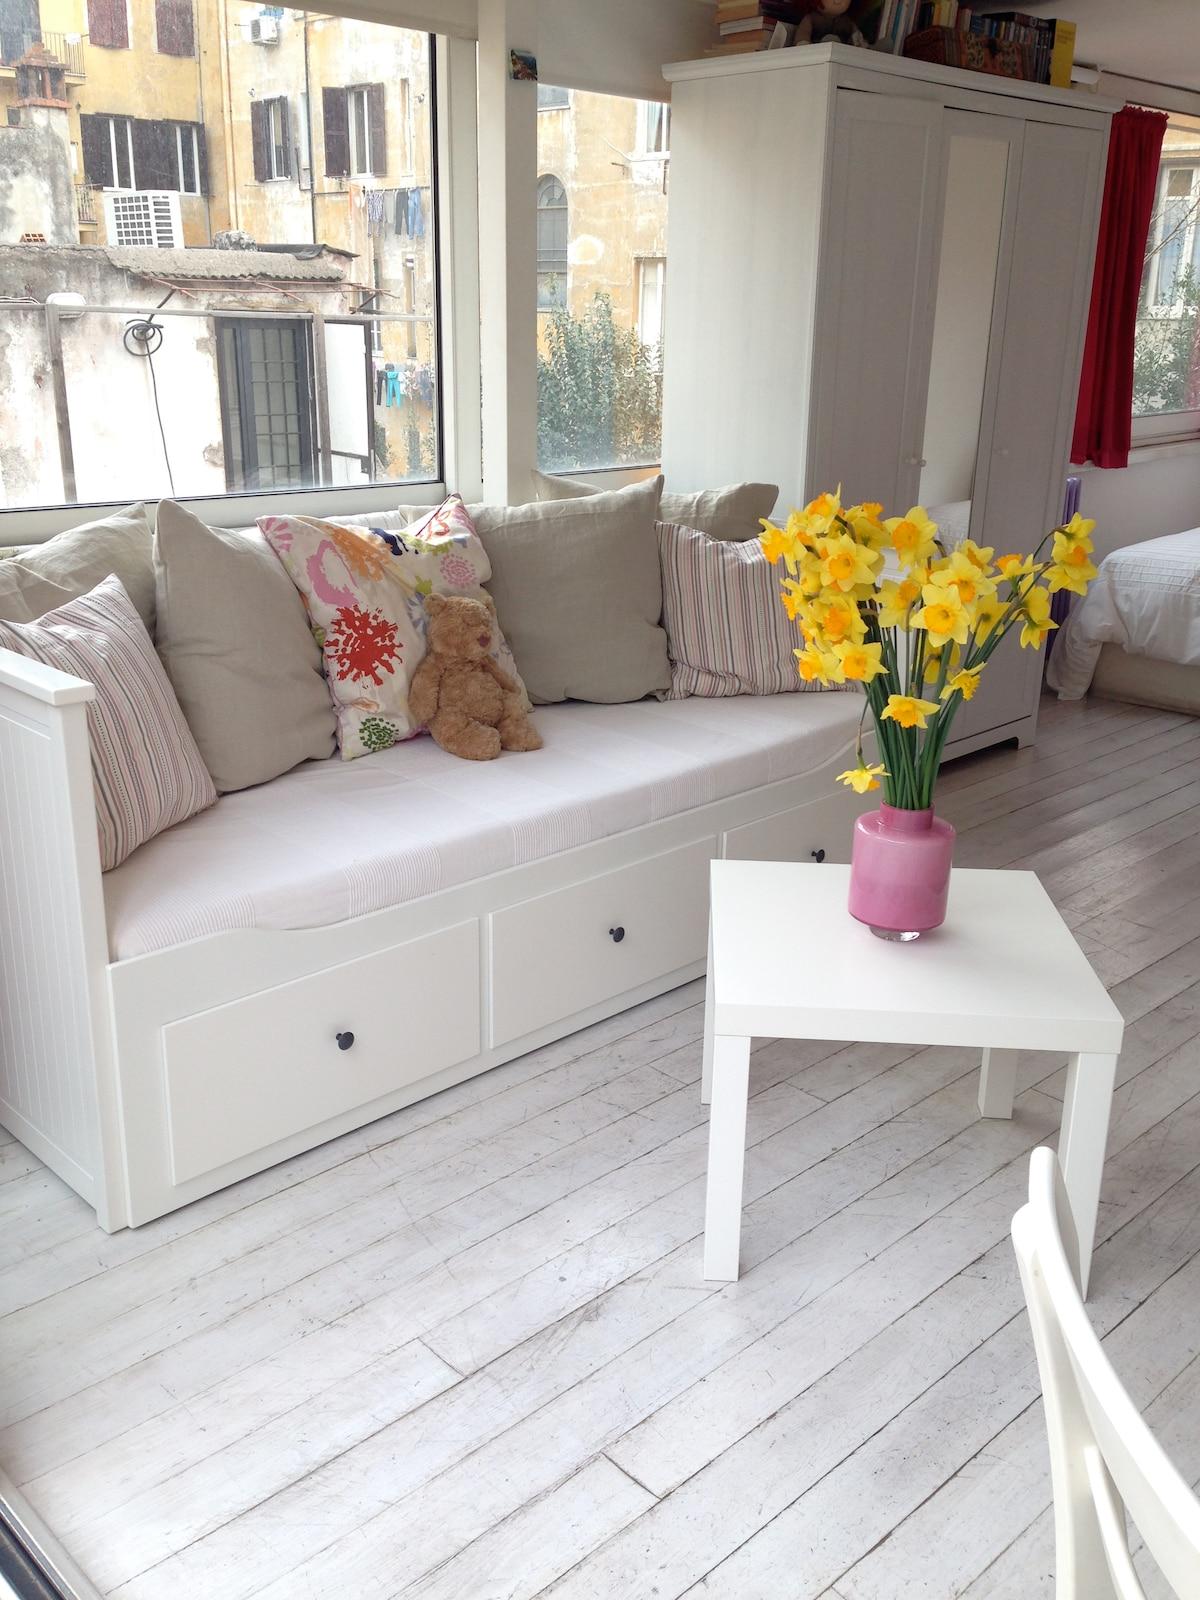 Single Bed-Sofa